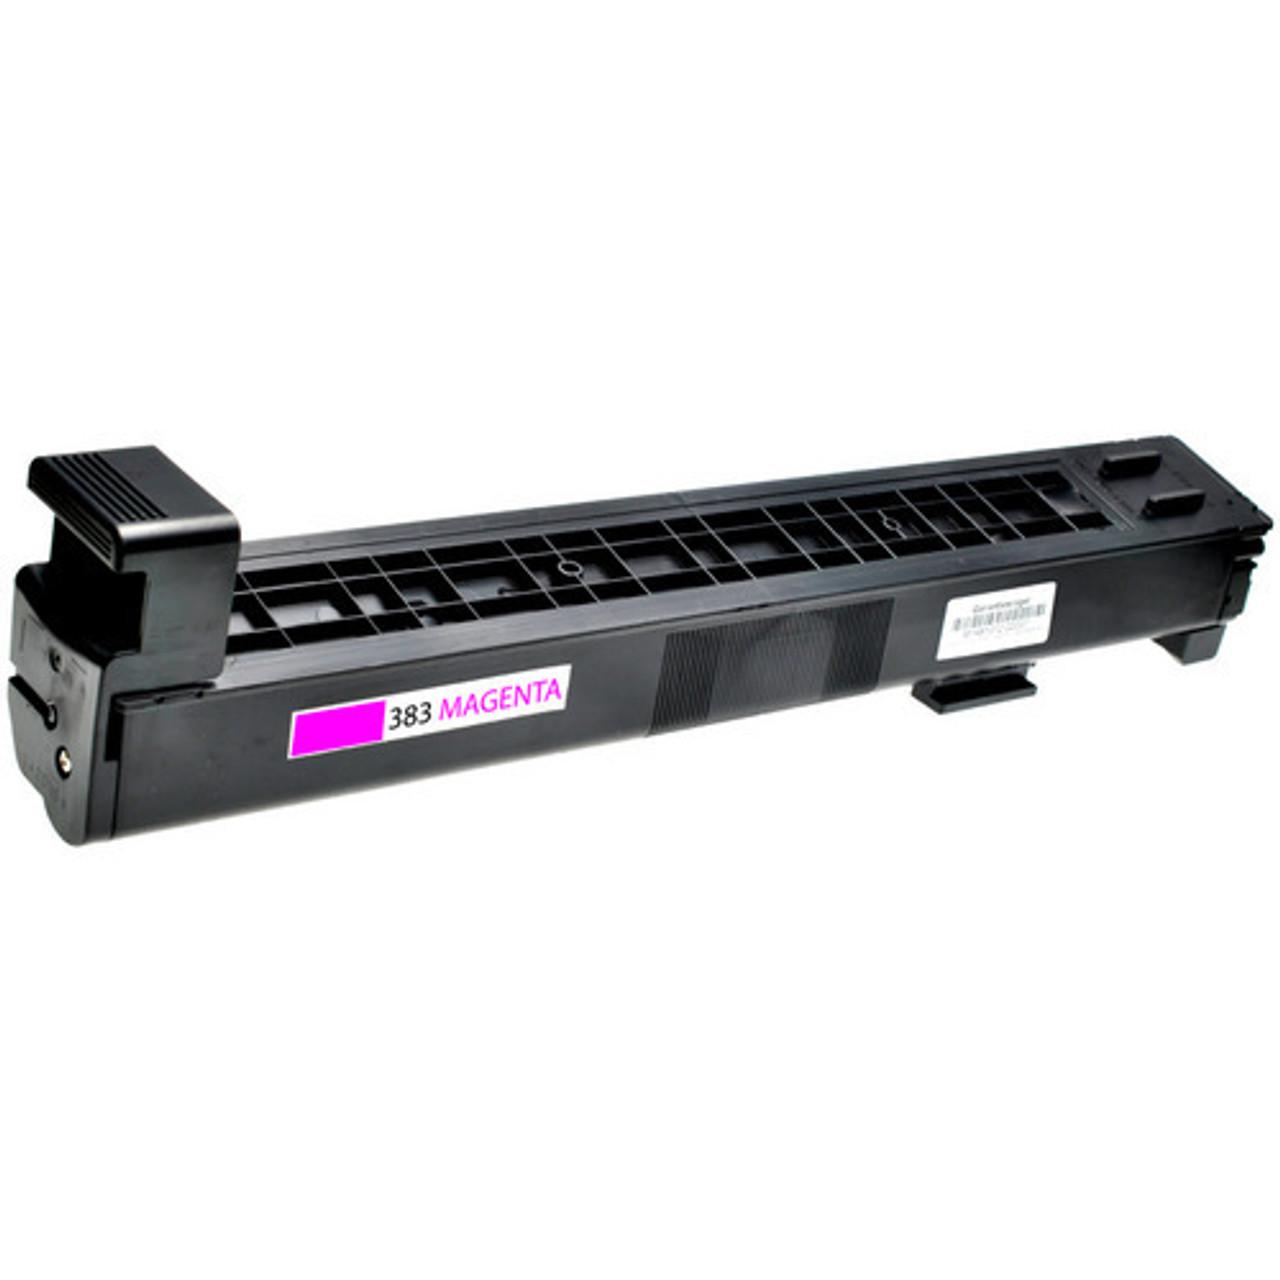 NEW GENUINE HP Color LaserJet CP6015dn CP6015X Printer Cyan TONER CB381A 824A